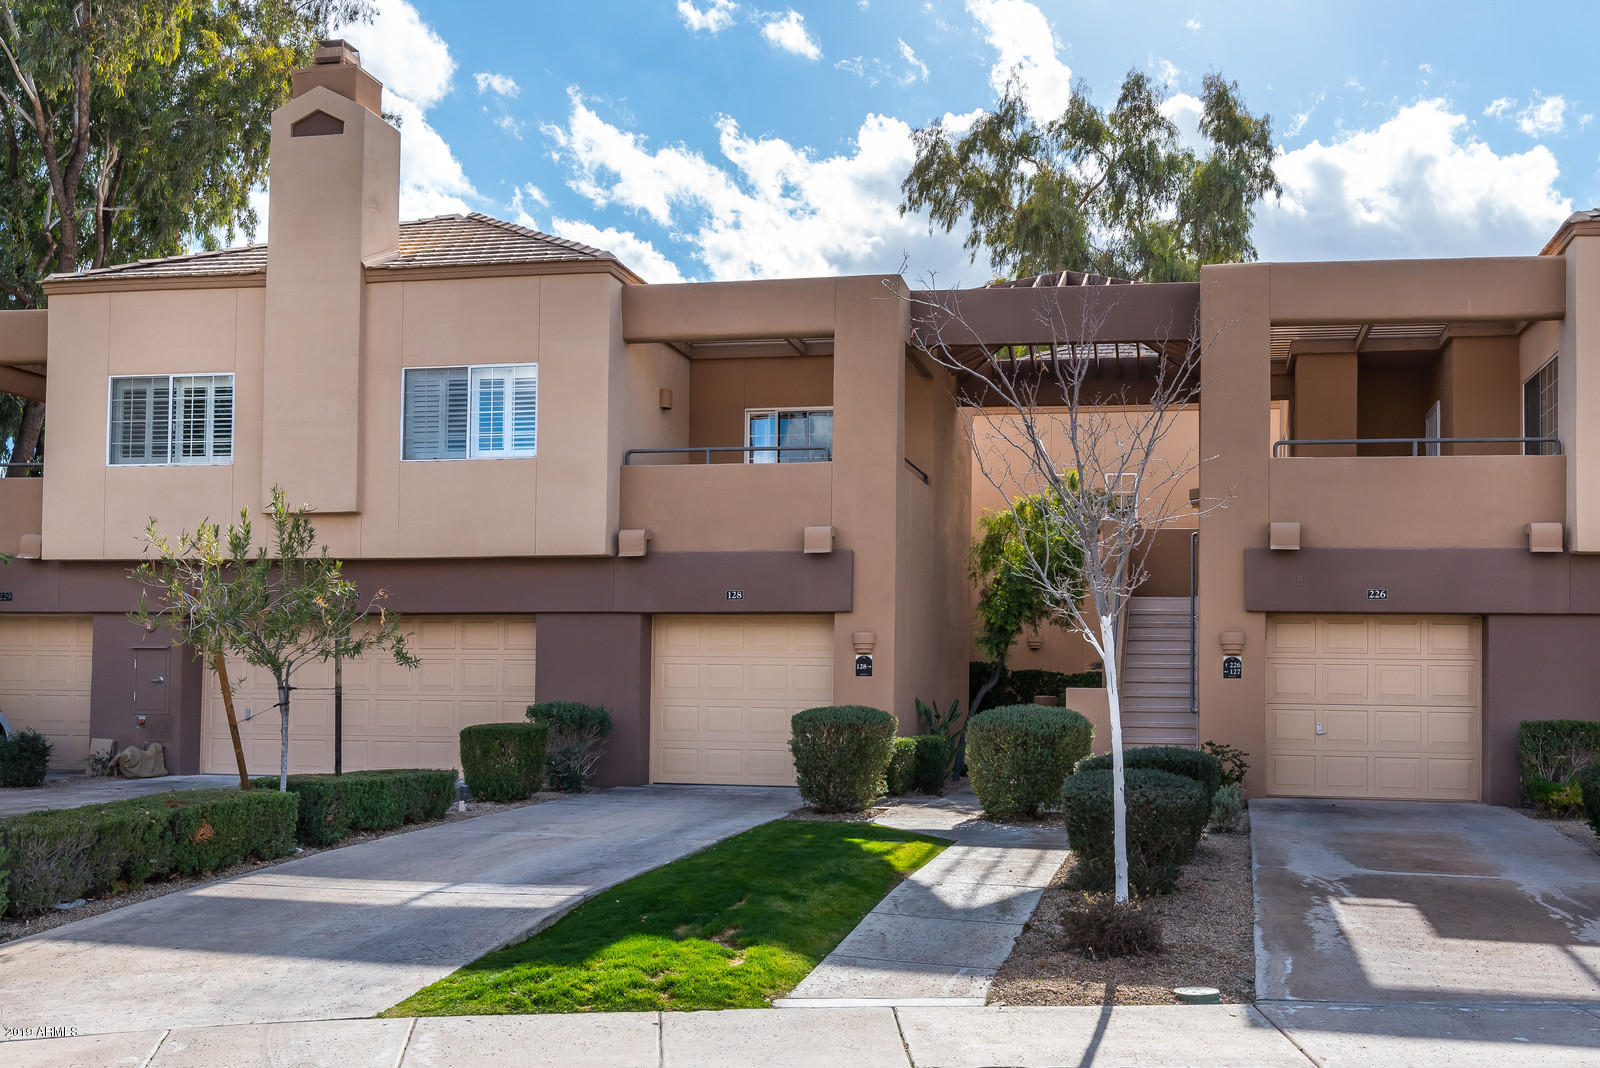 Photo of 7710 E GAINEY RANCH Road #128, Scottsdale, AZ 85258